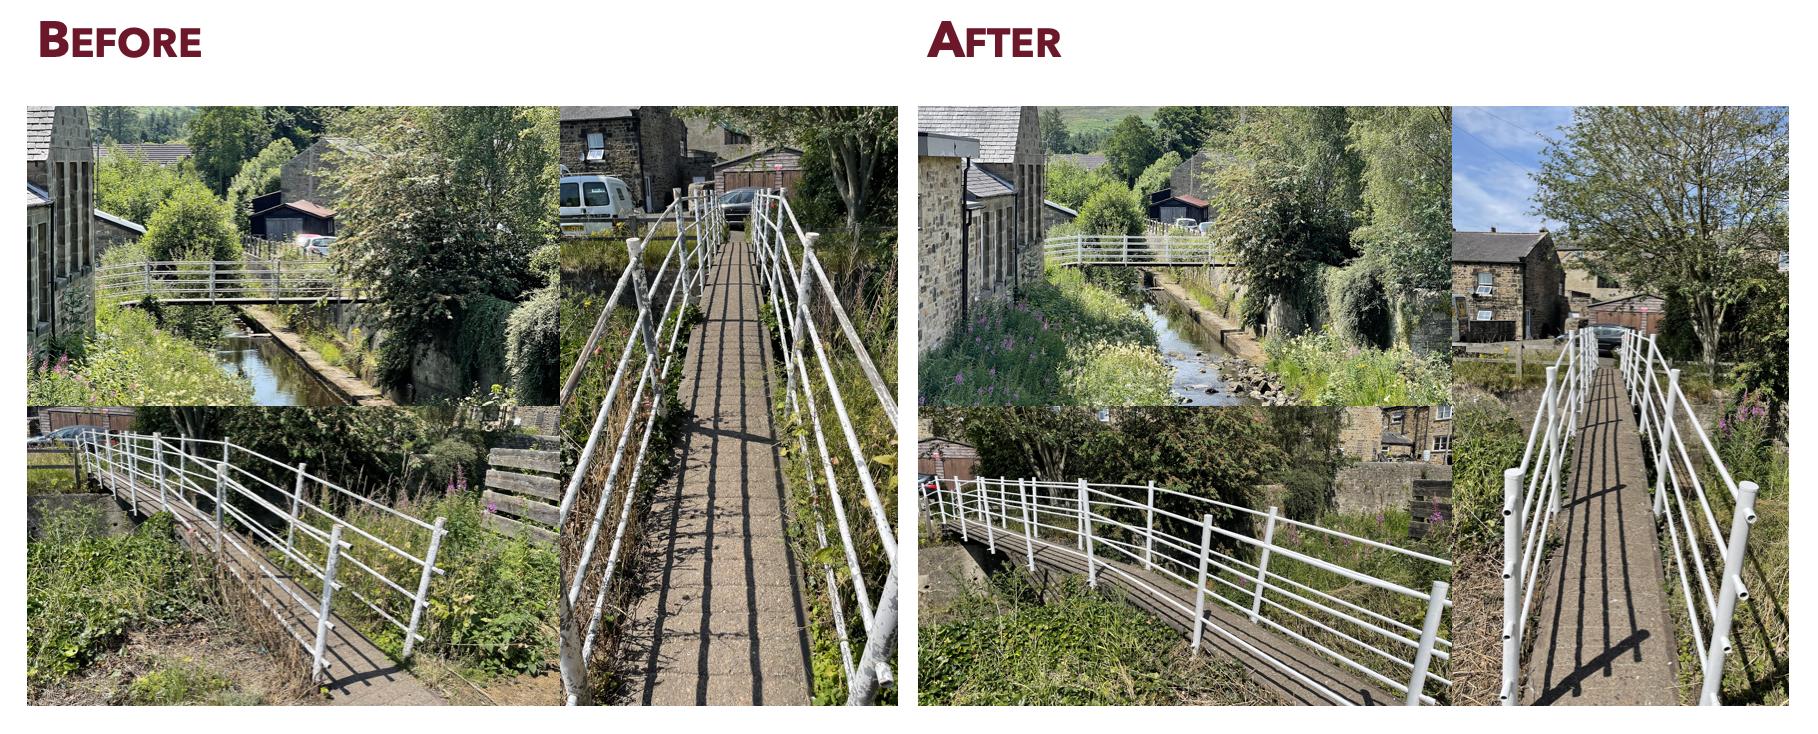 photos of bridge